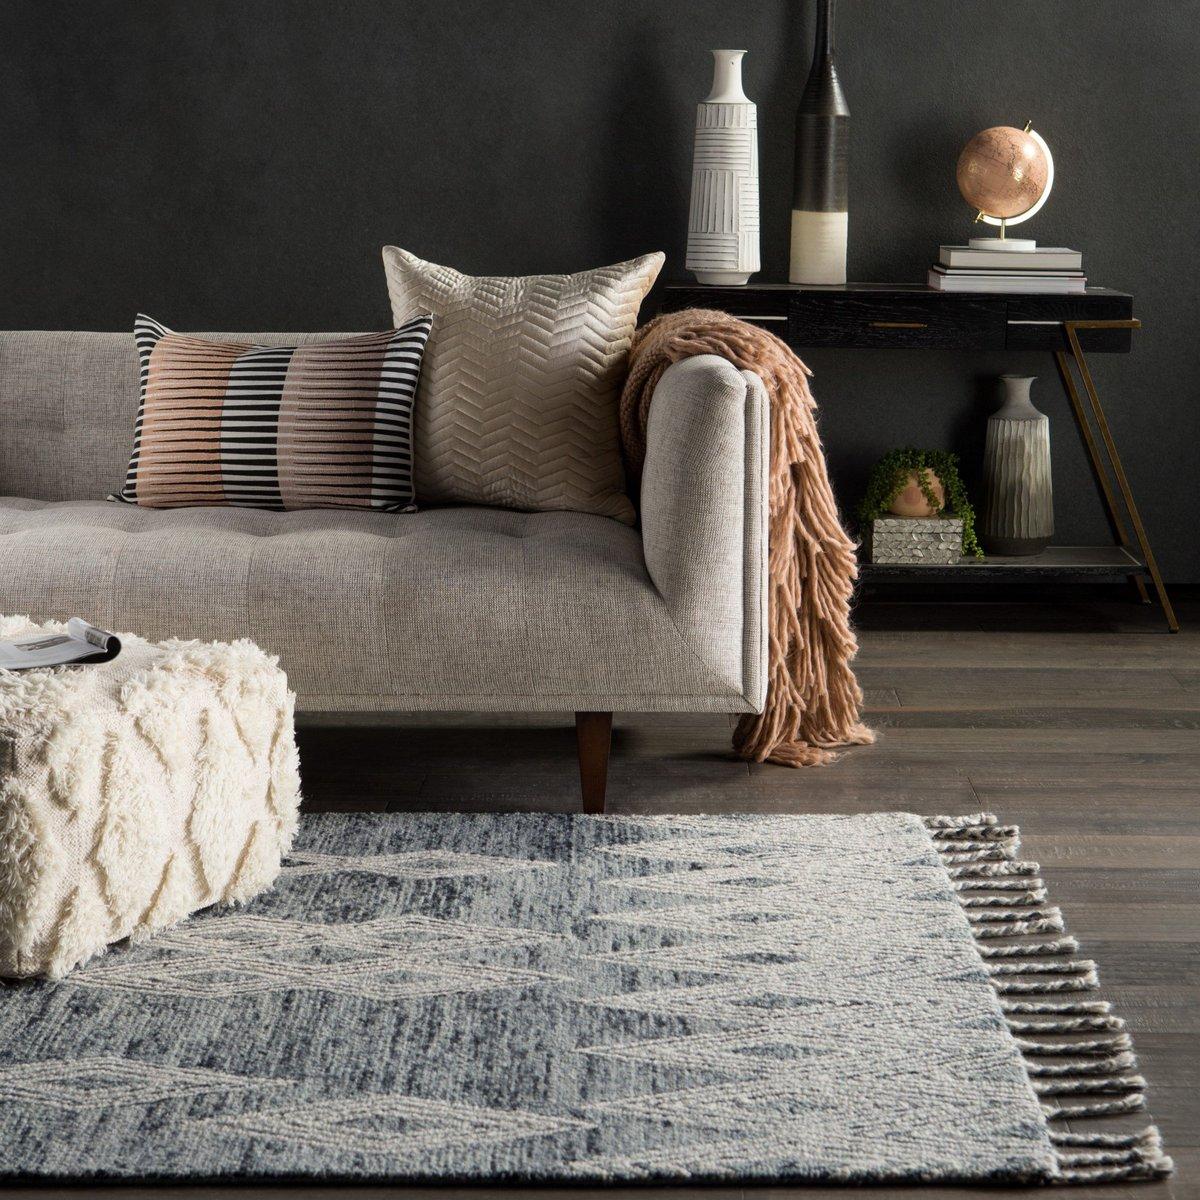 Moody Boho Living Room Decor Ideas